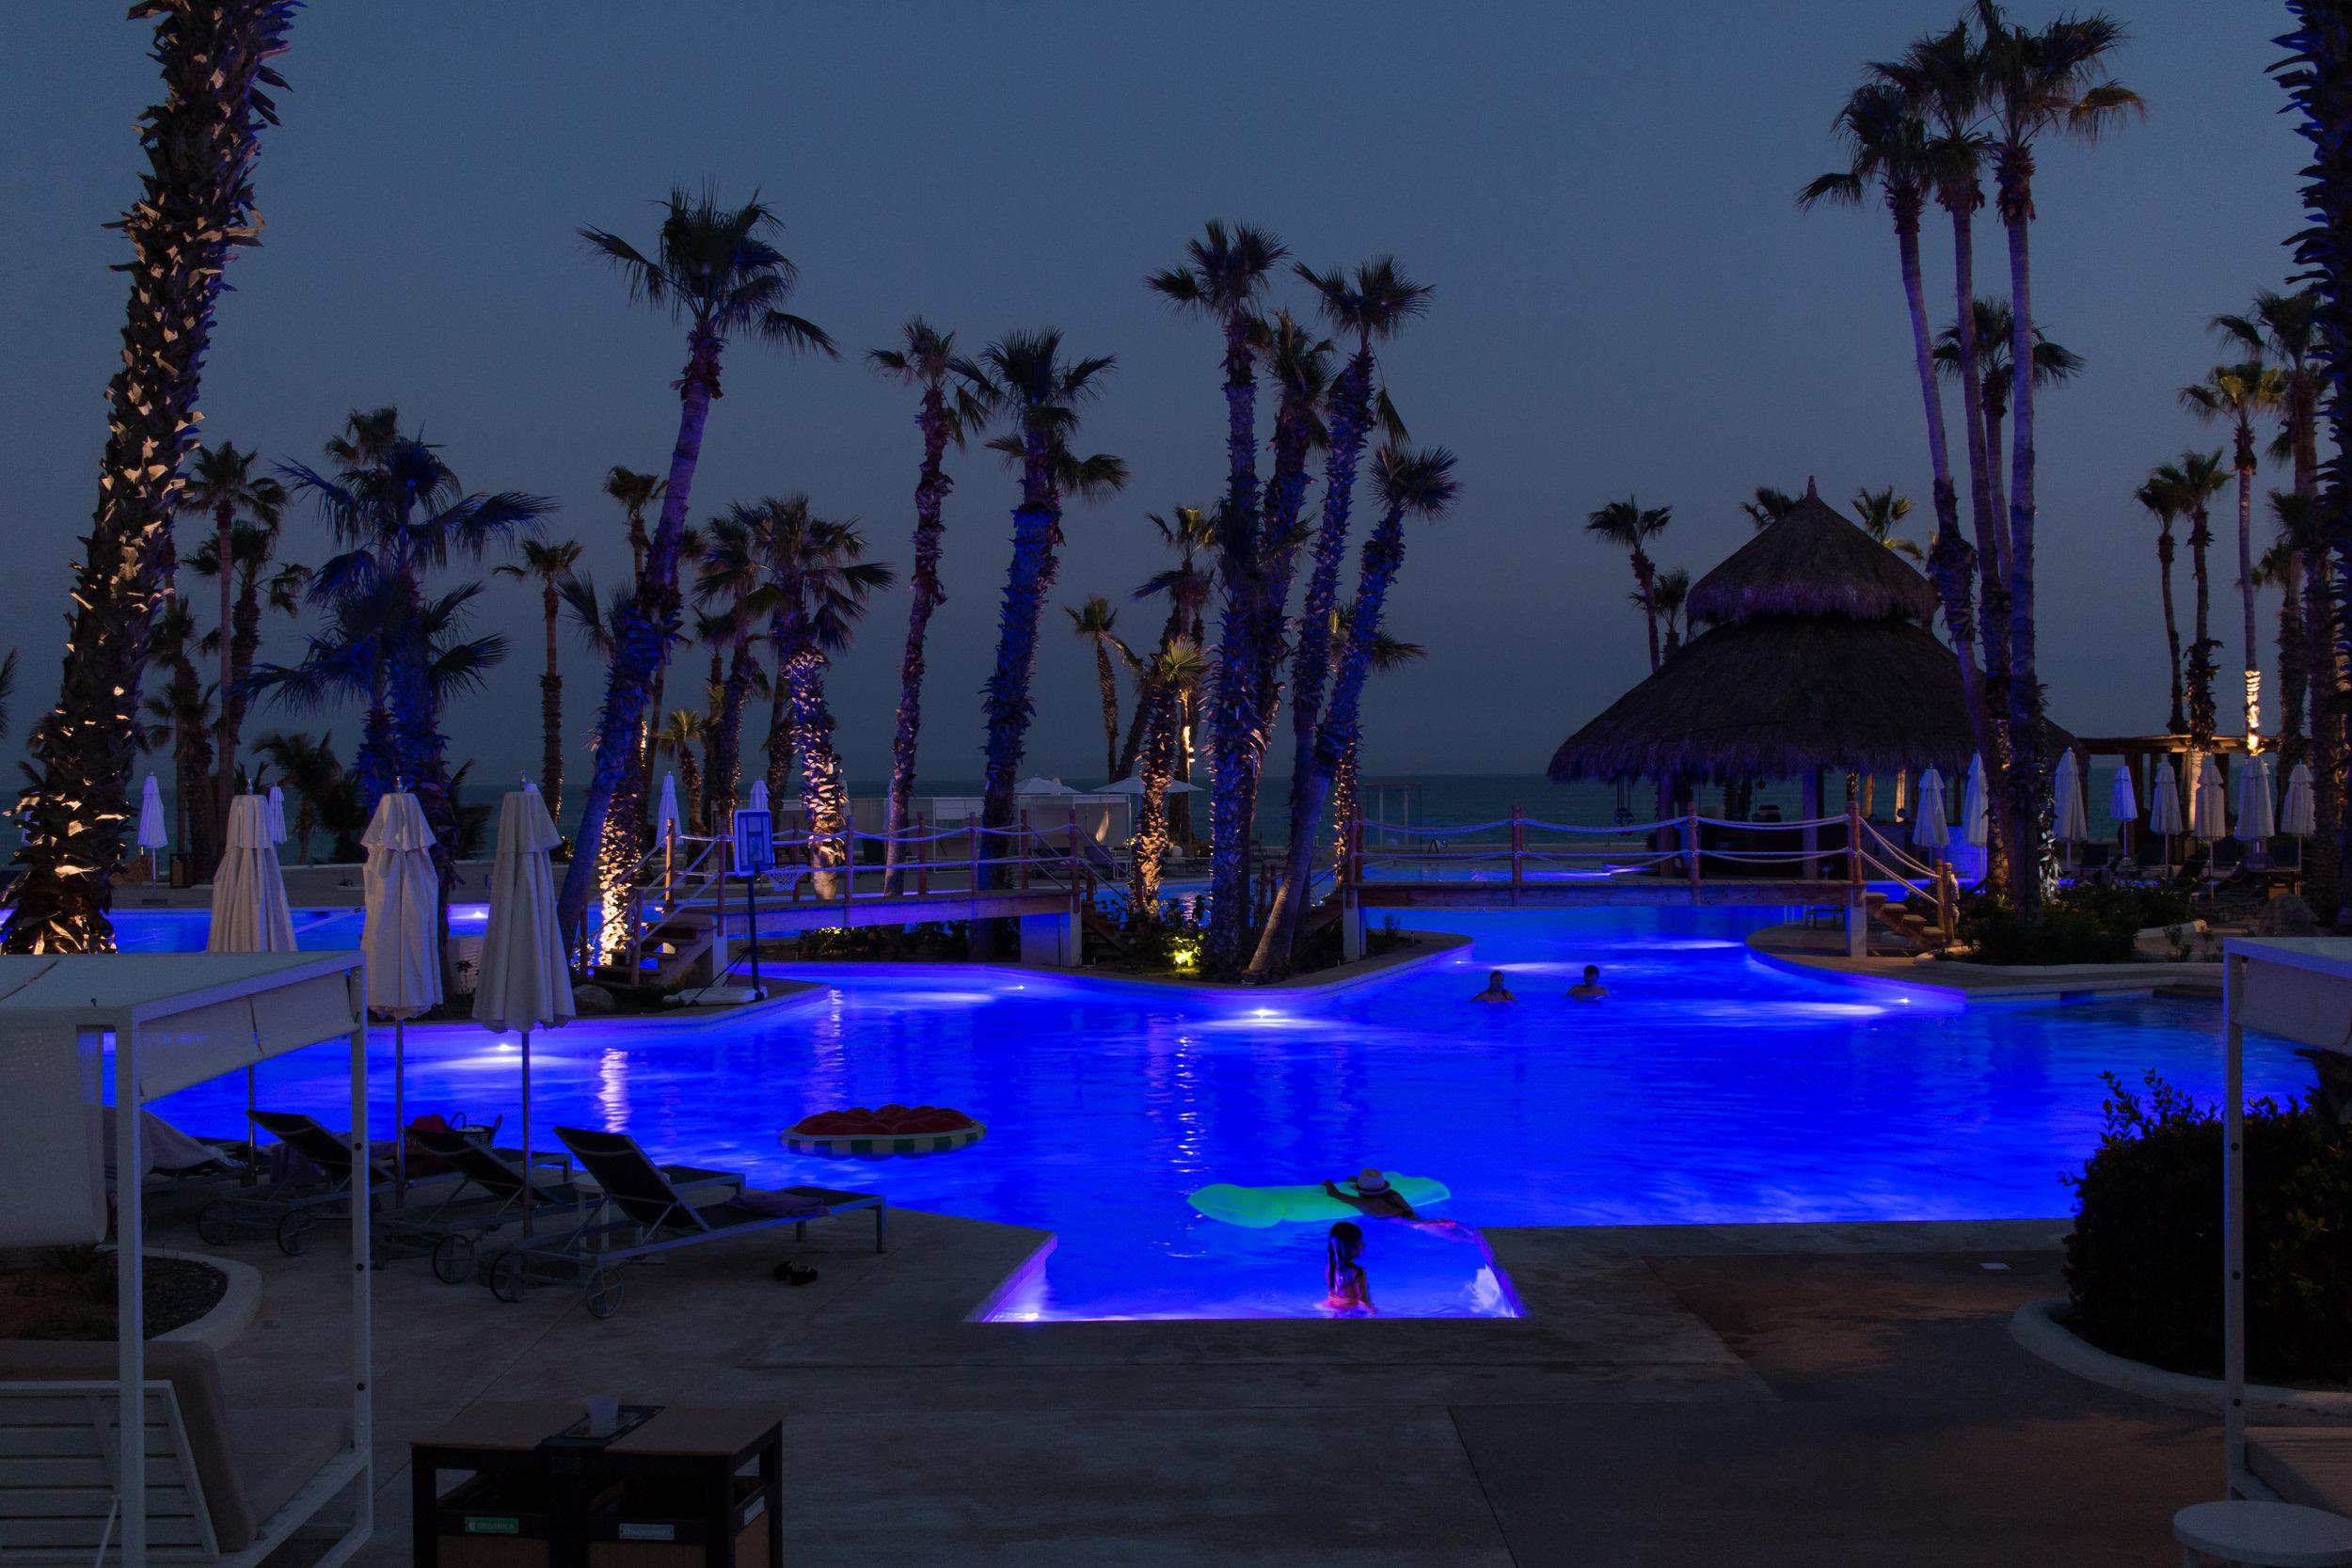 paradisus-los-cabos-swimming-pool-all-inclusive-mexico-resort